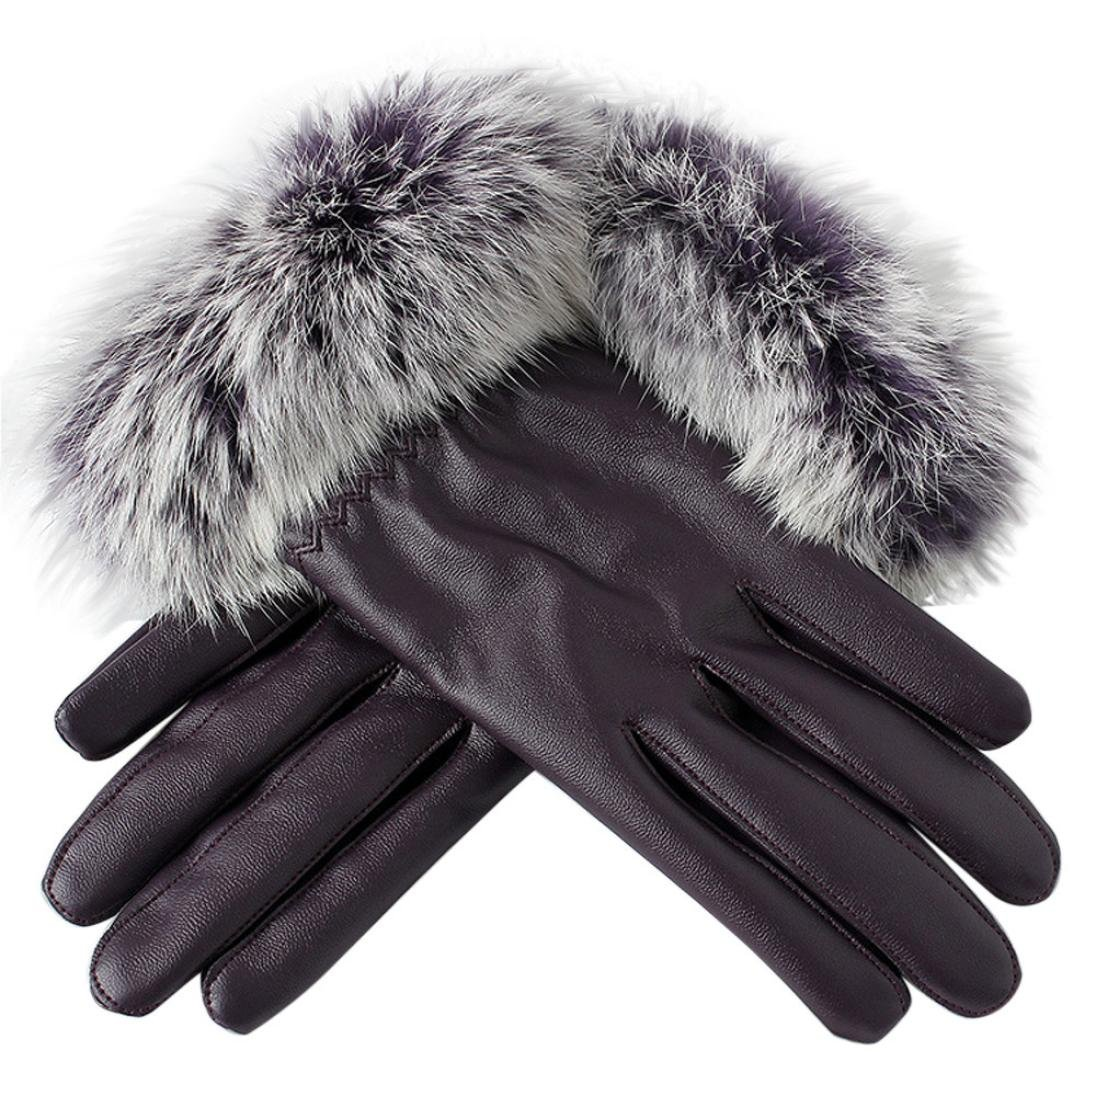 Gardening Supplies Liberal Scan Knit Shell Latex Palm Gloves Size 8 Medium